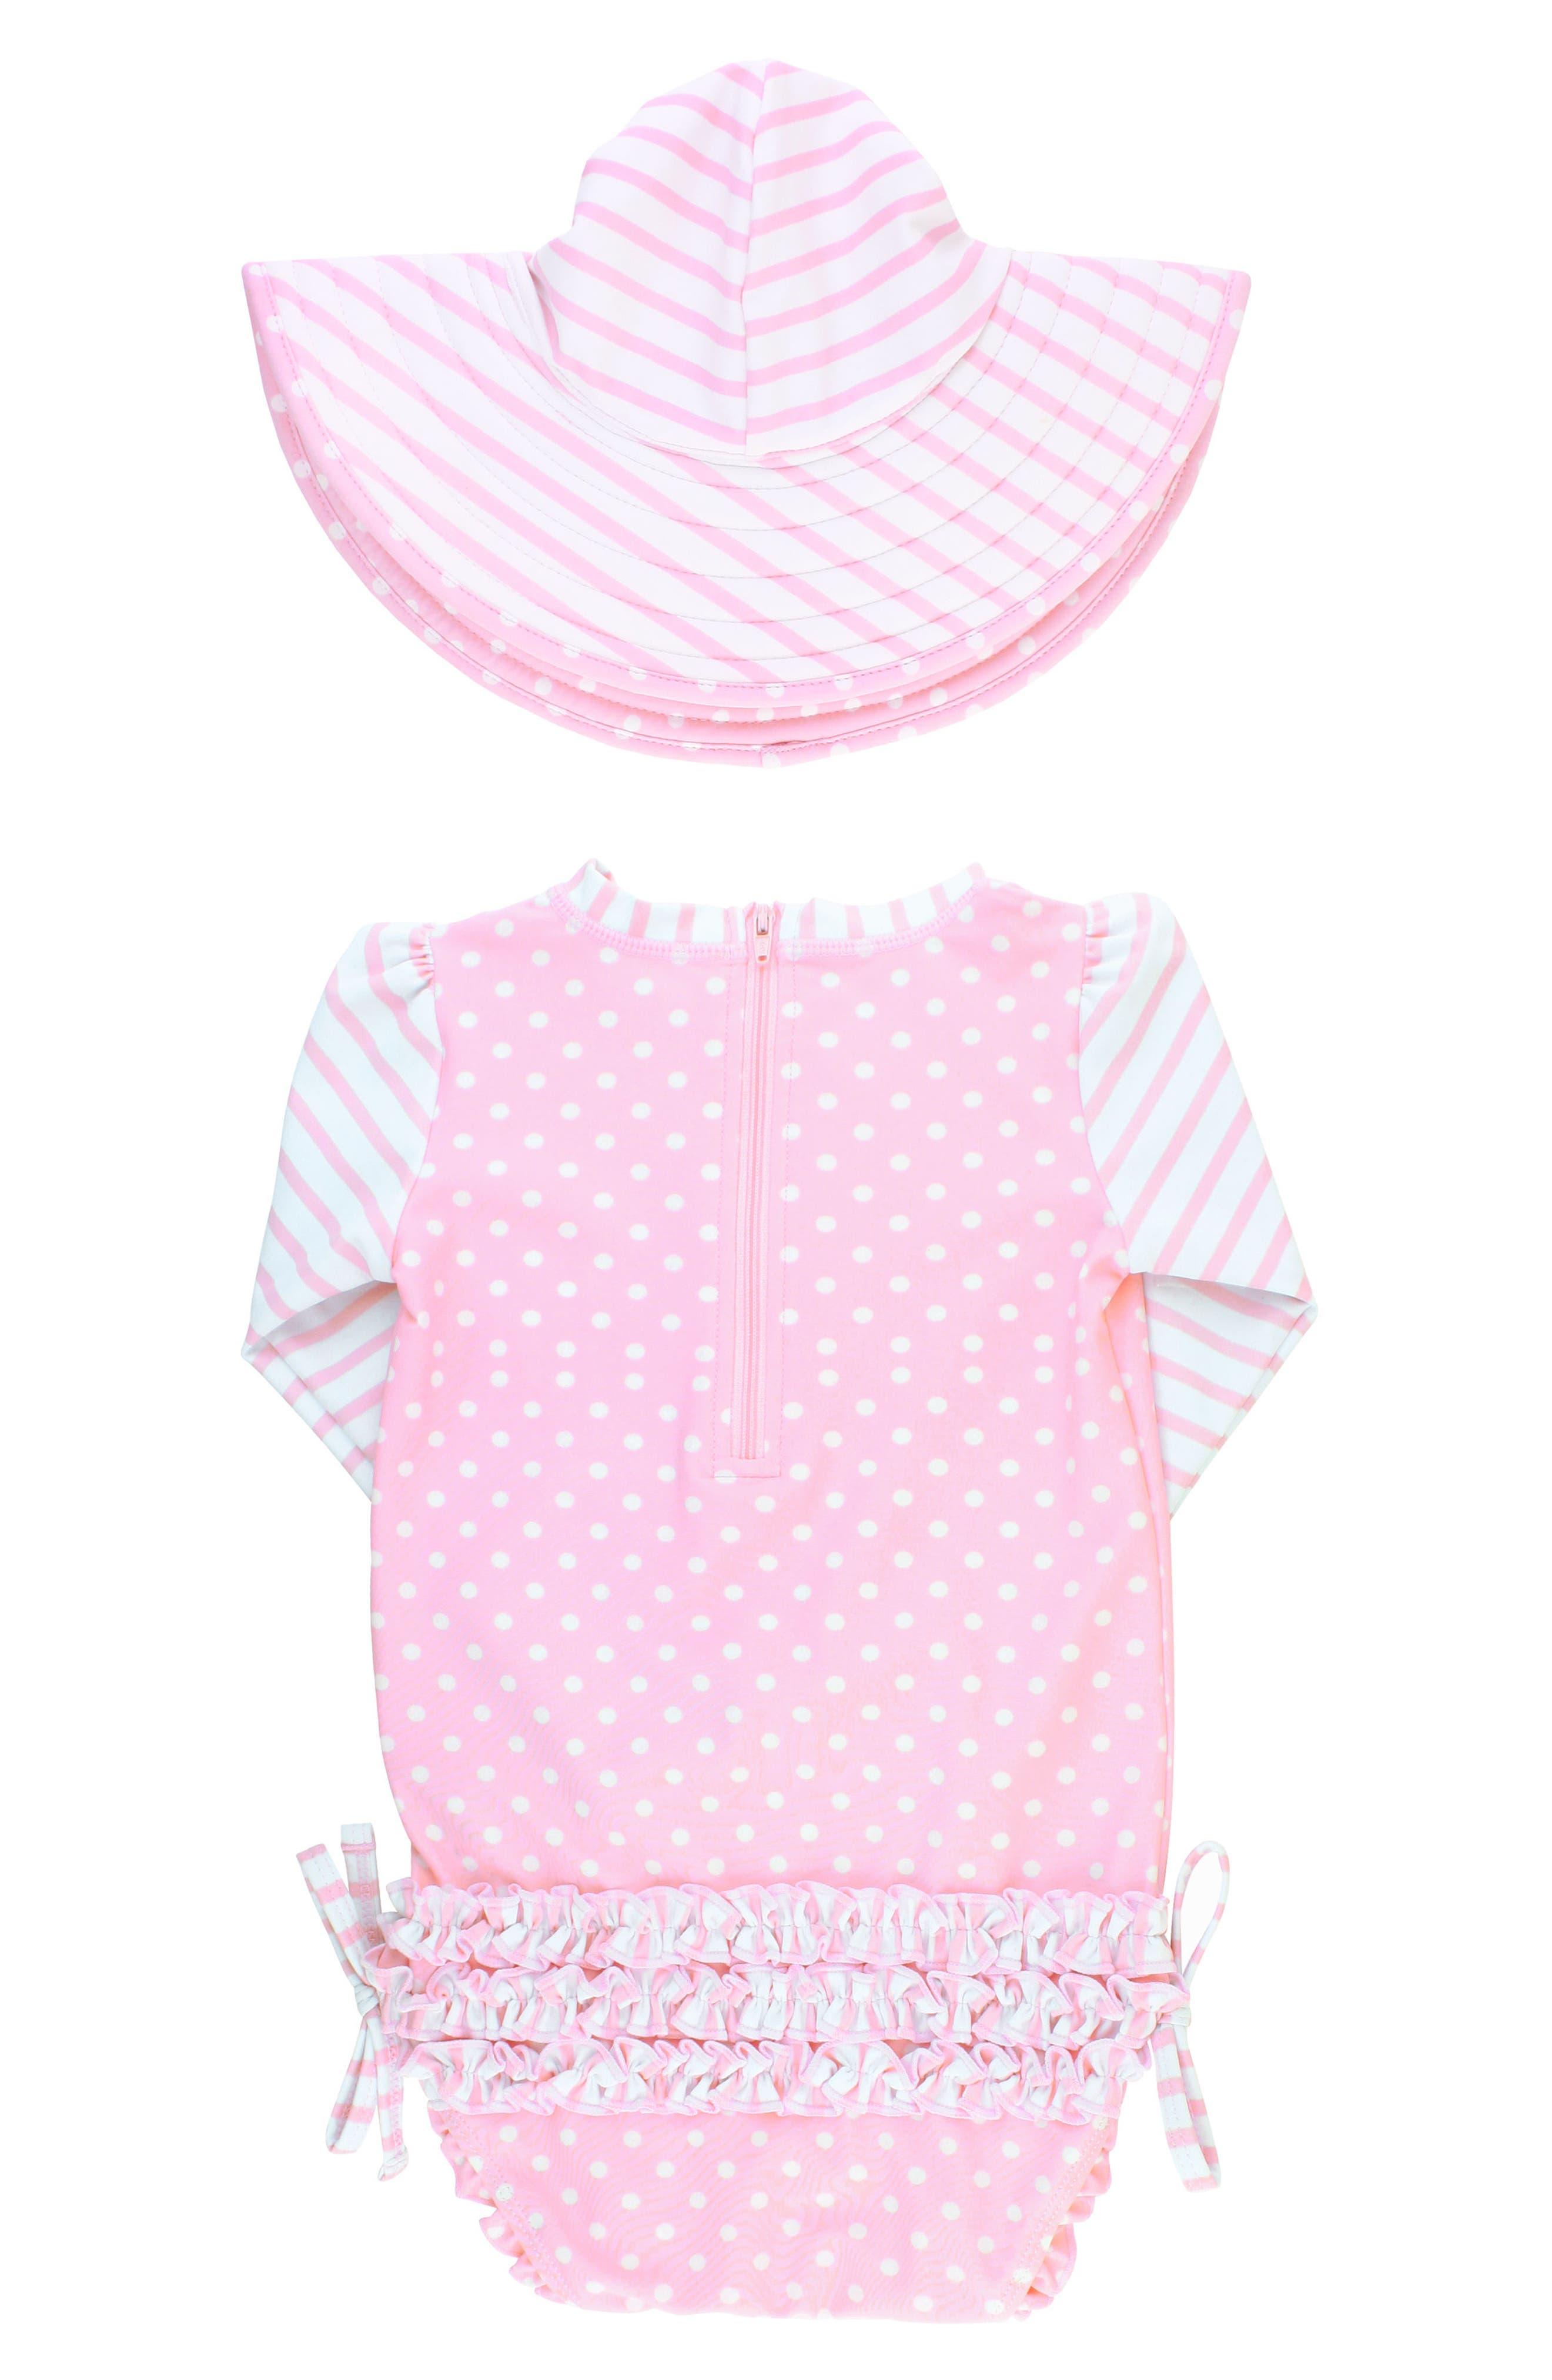 Ruffle Butts Polka Dot One-Piece Rashguard Swimsuit & Sun Hat Set,                             Alternate thumbnail 2, color,                             Pink